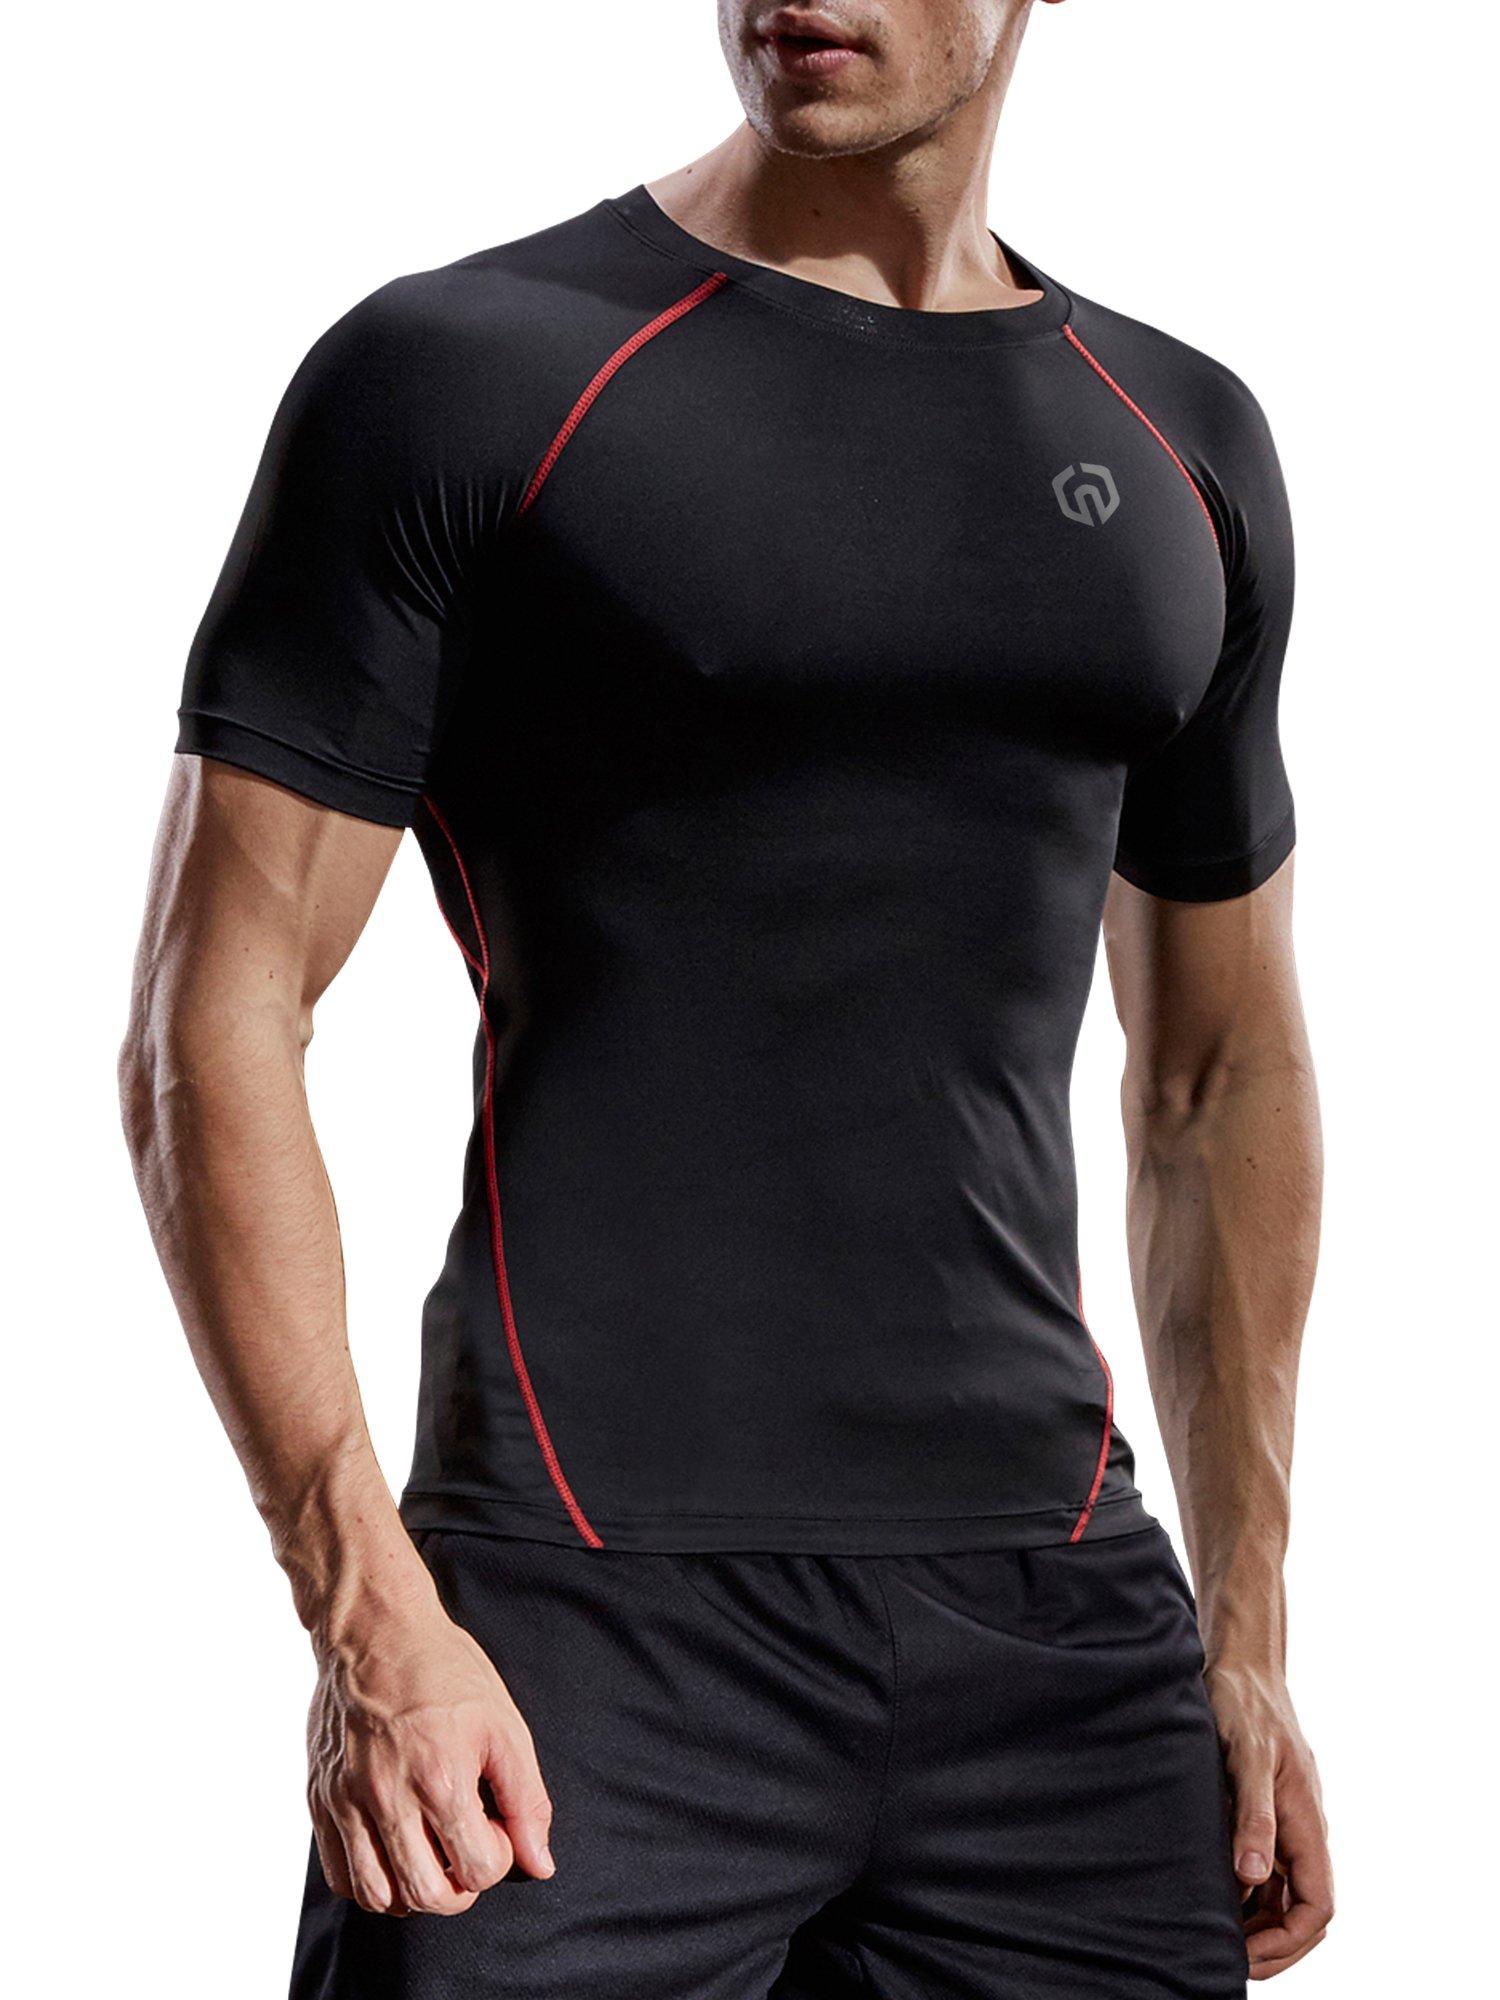 Neleus Men's Compression Baselayer Athletic Workout T Shirts,5022,One Piece,Black(red Striped),US L,EU XL by Neleus